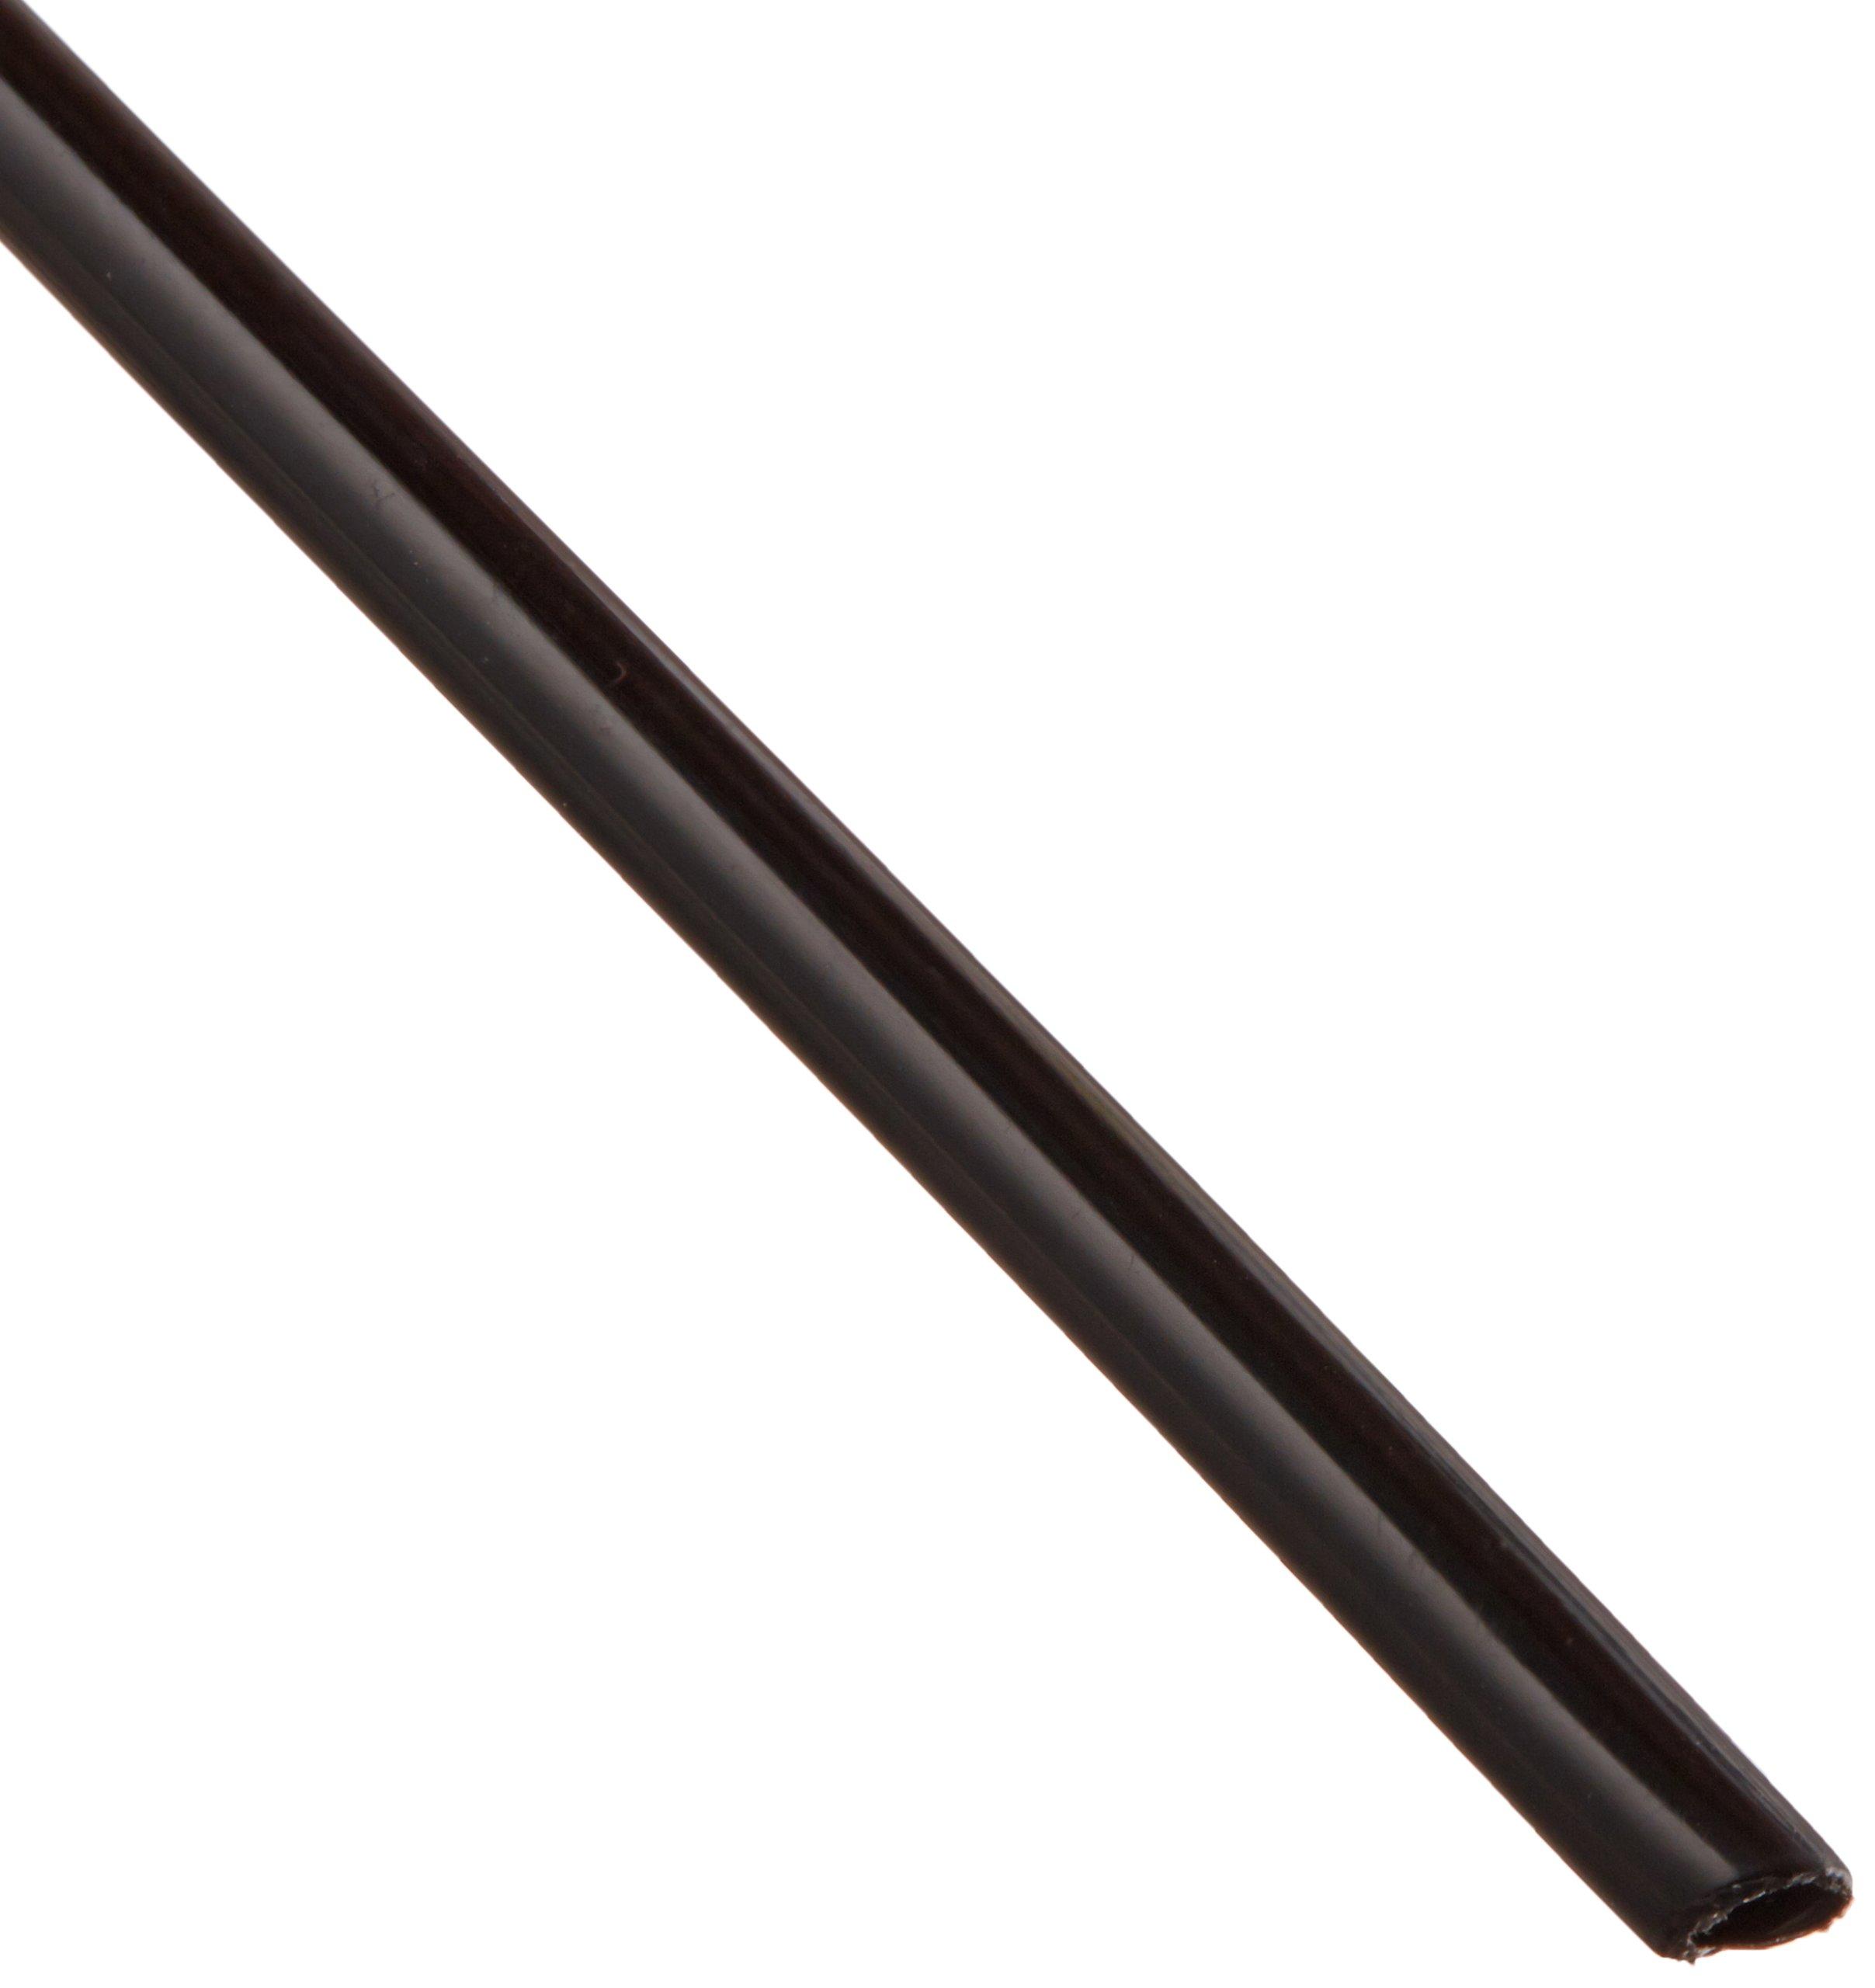 Nylon Vacuum Flexible Tubing, Black, Opaque, 0.078'' ID, 1/8'' OD, 0.024'' Wall, 50' Length